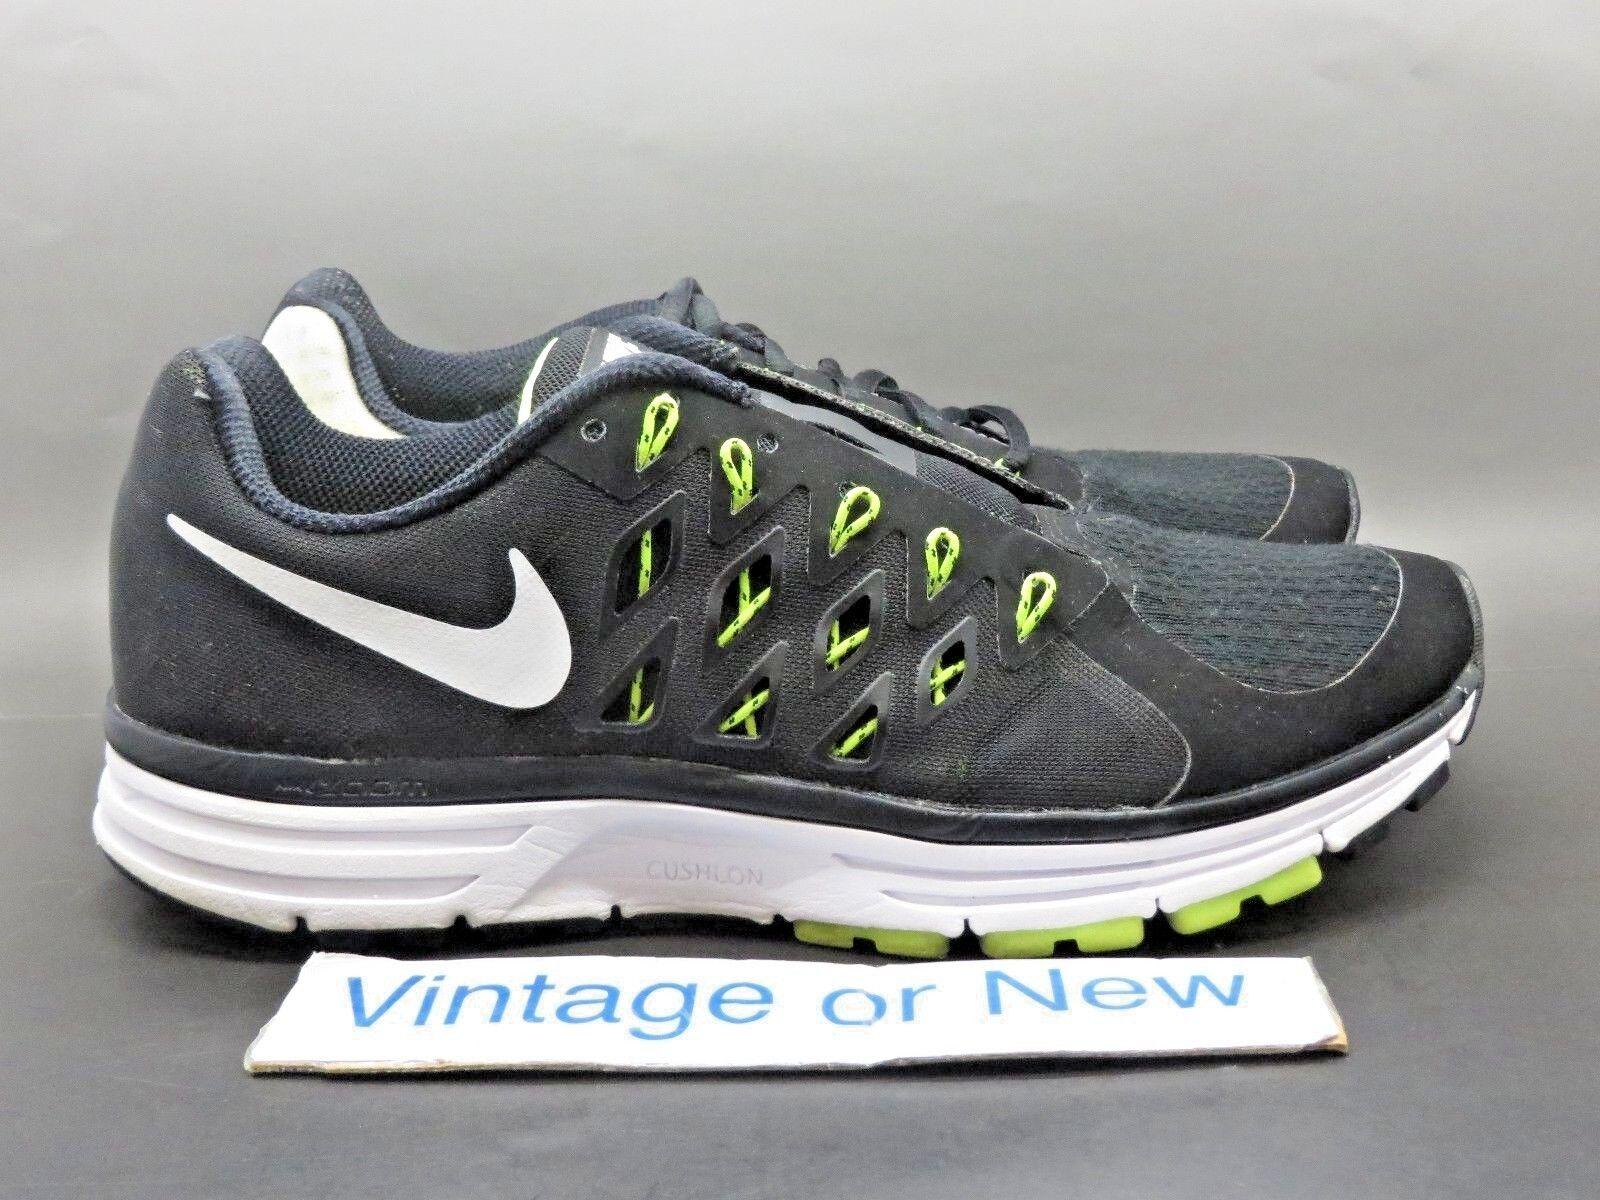 cheap for discount b3dd4 d2853 Women s Nike Zoom Vomero 9 Black Black Black White Volt Running Shoes  642196-001 sz